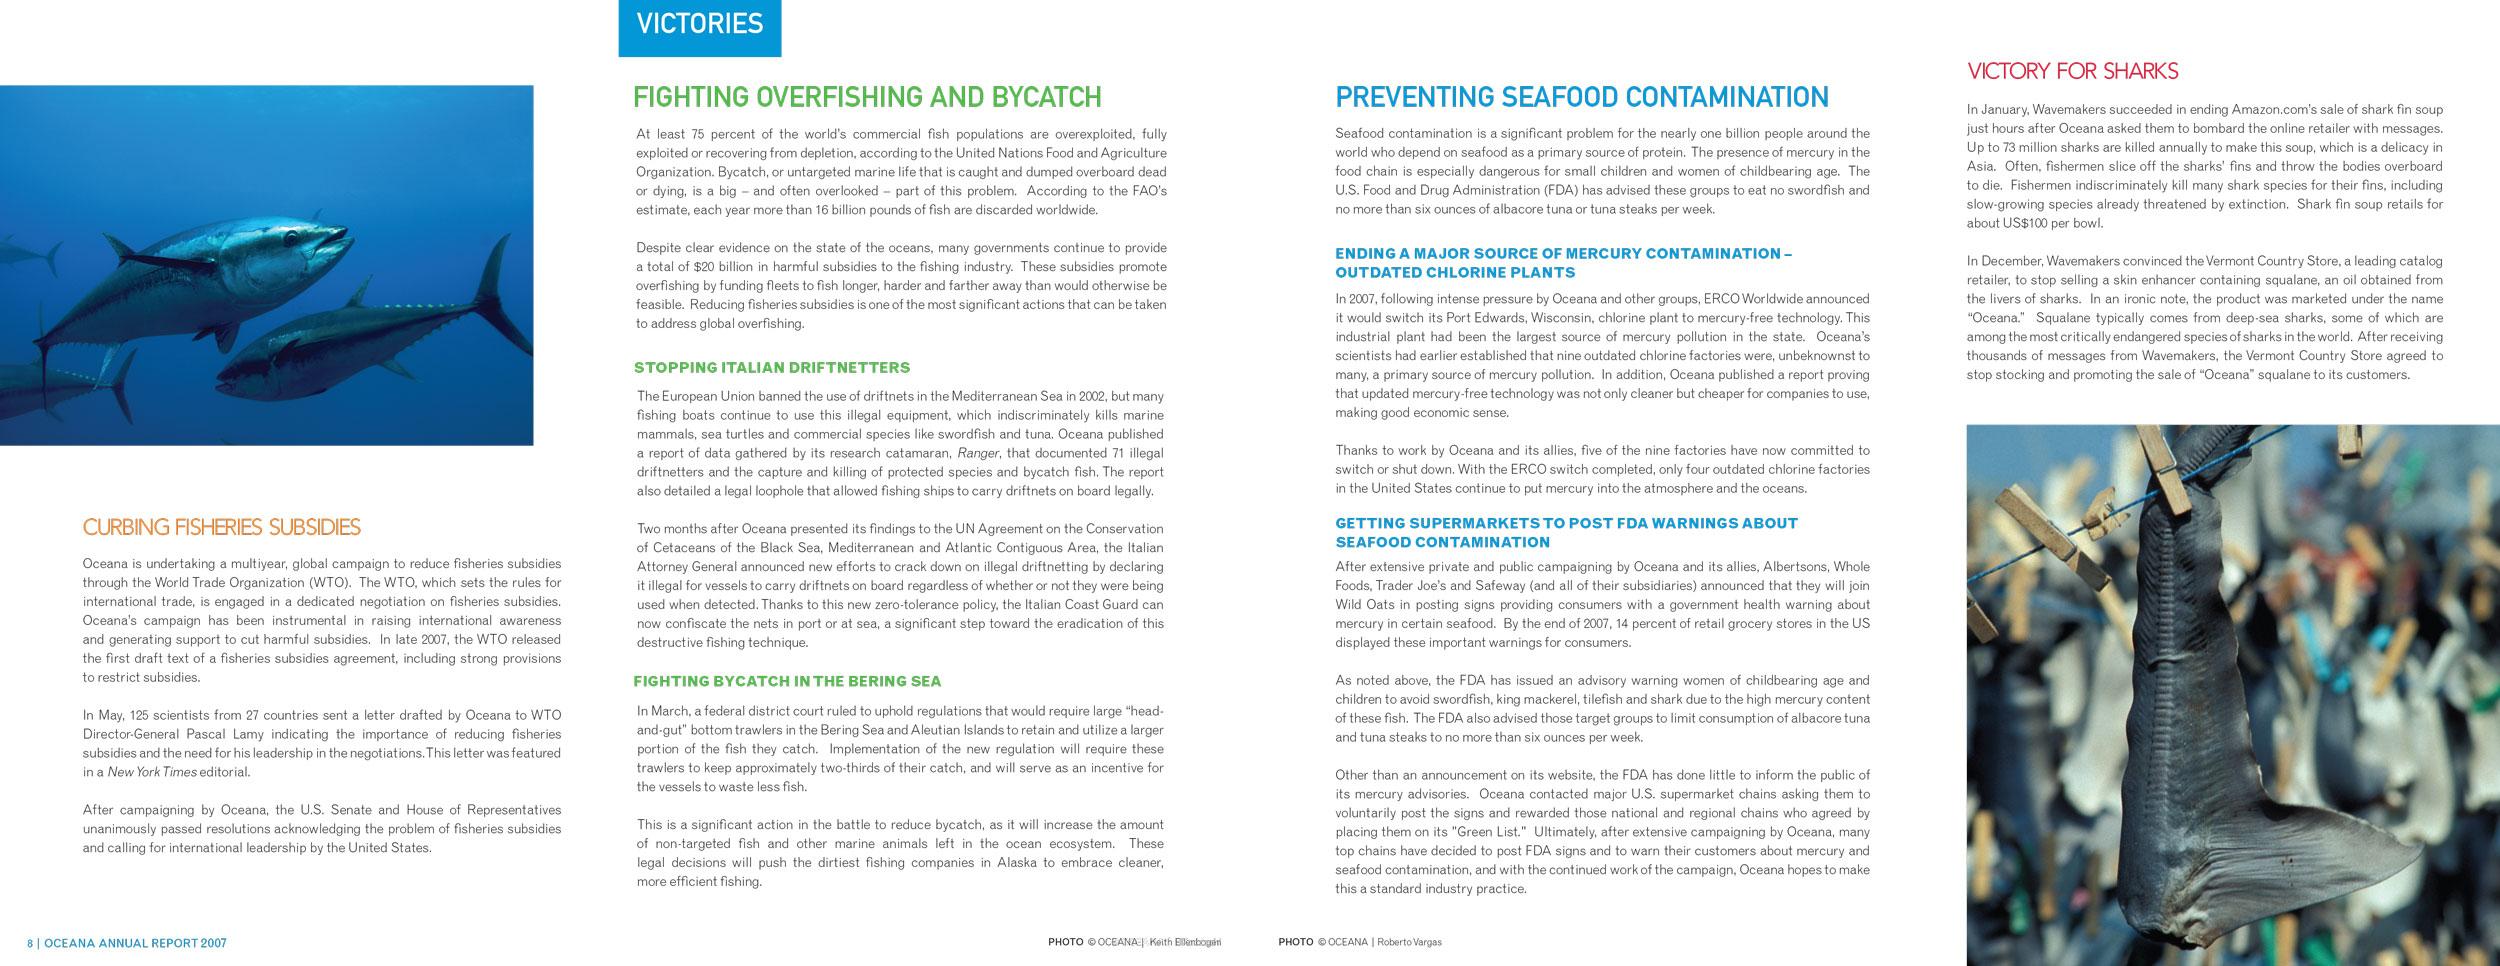 Oceana_annual_report07_FINAL-5.jpg